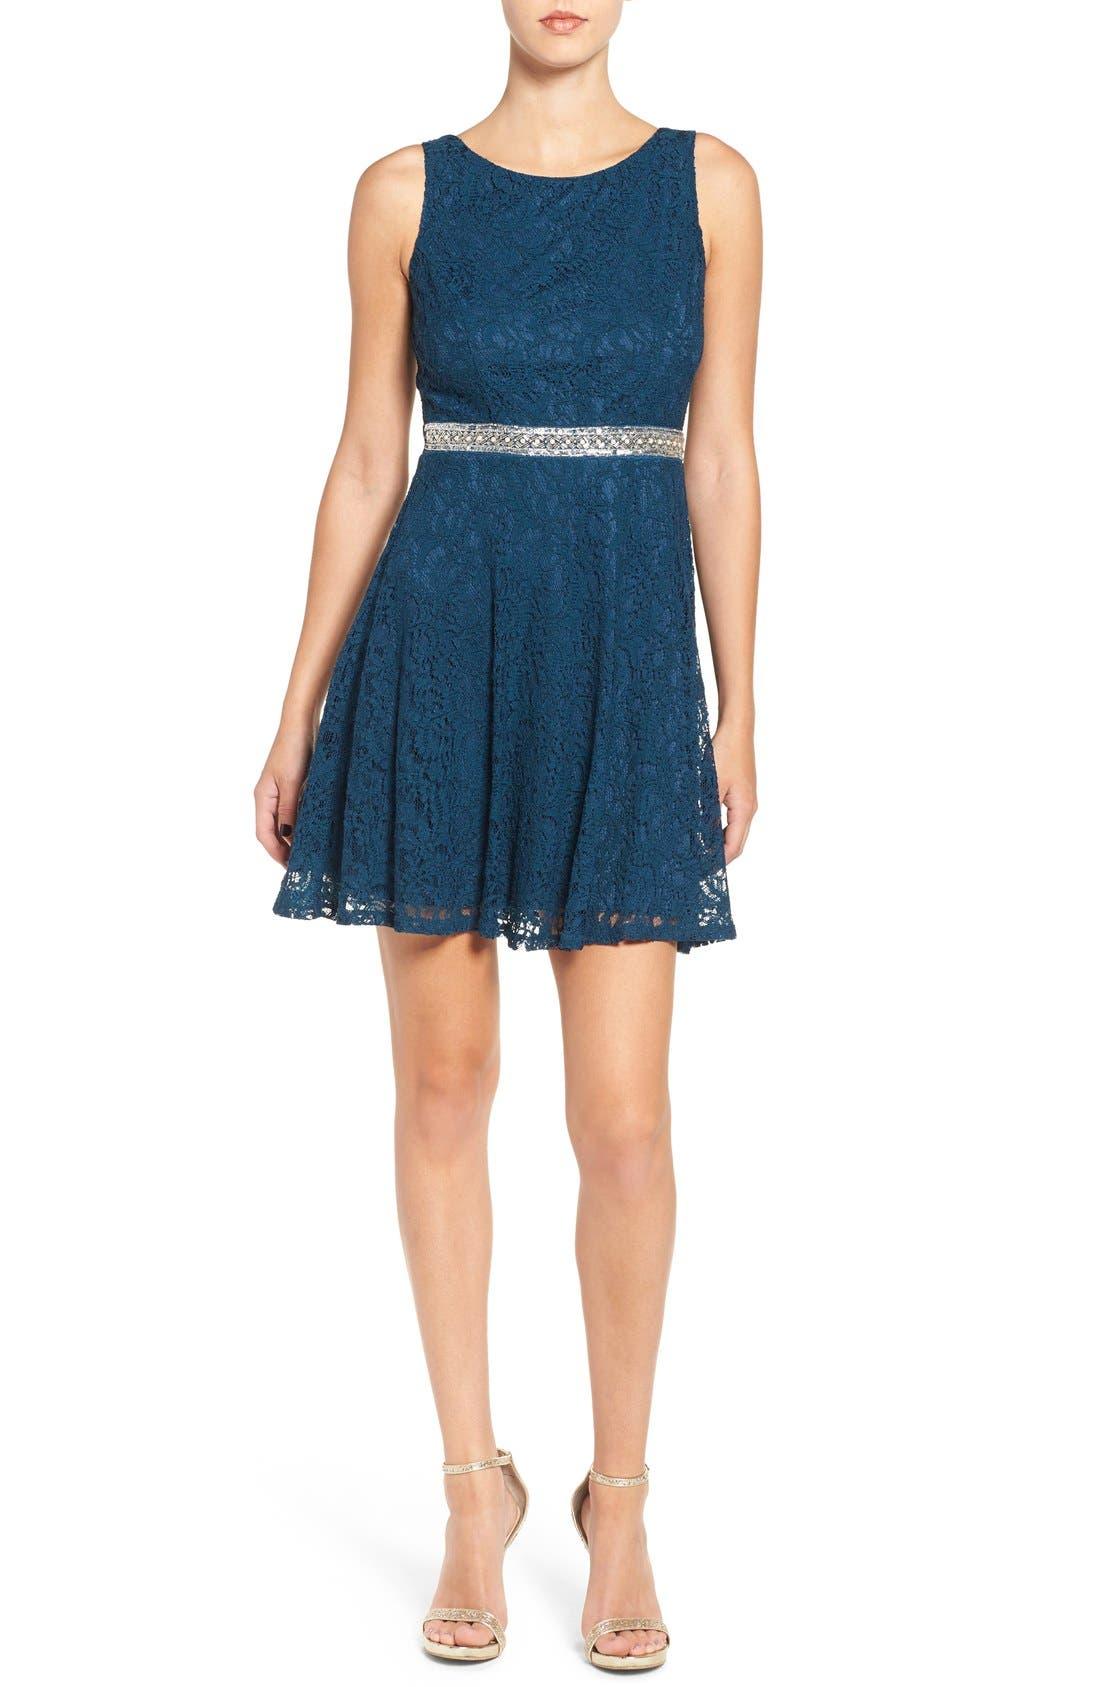 Alternate Image 1 Selected - Speechless Embellished Lace Skater Dress